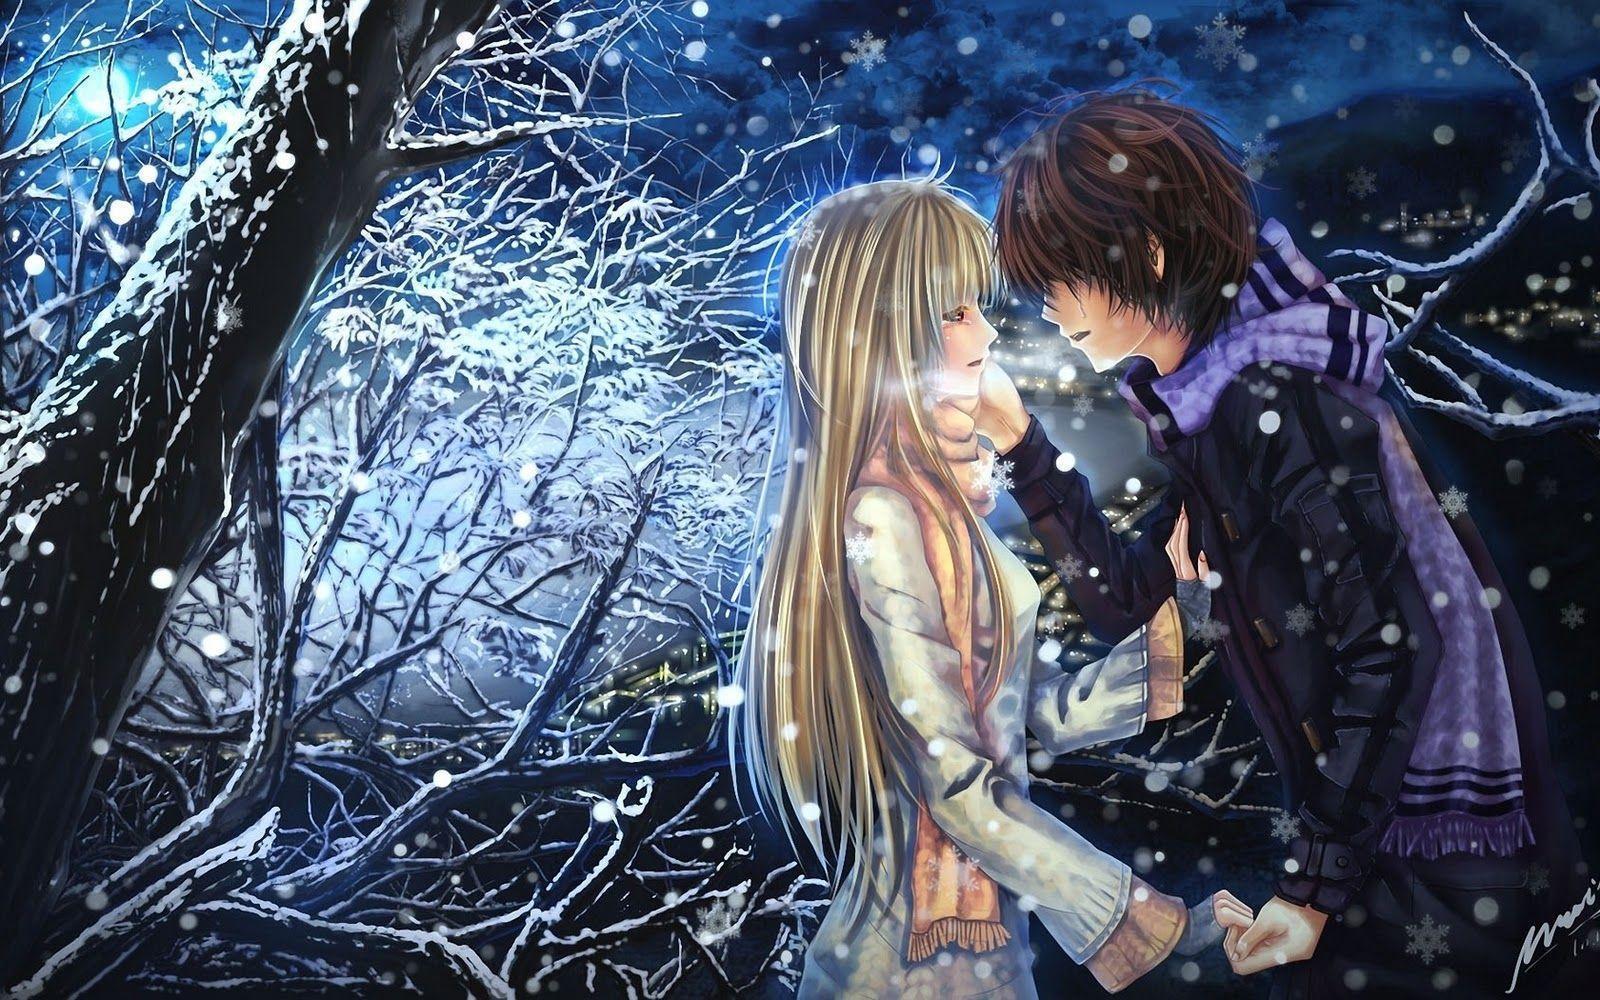 Download Anime Boy Girl Couple Love Cool Wallpaper 1600x1000